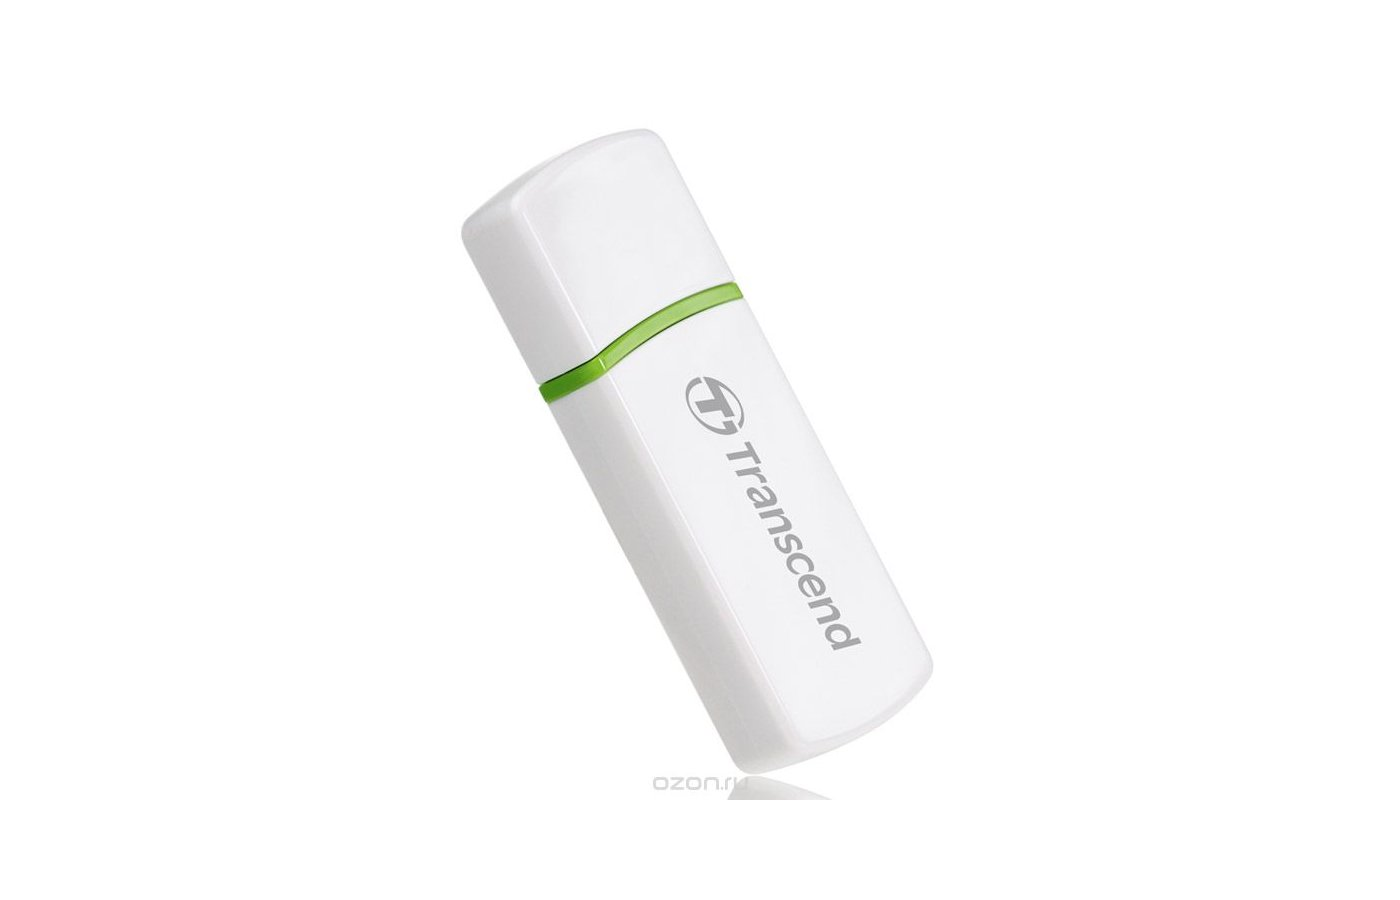 Картридер Transcend TS-RDP5W USB 2.0 MMC / SD / microSD / M2 Reader White